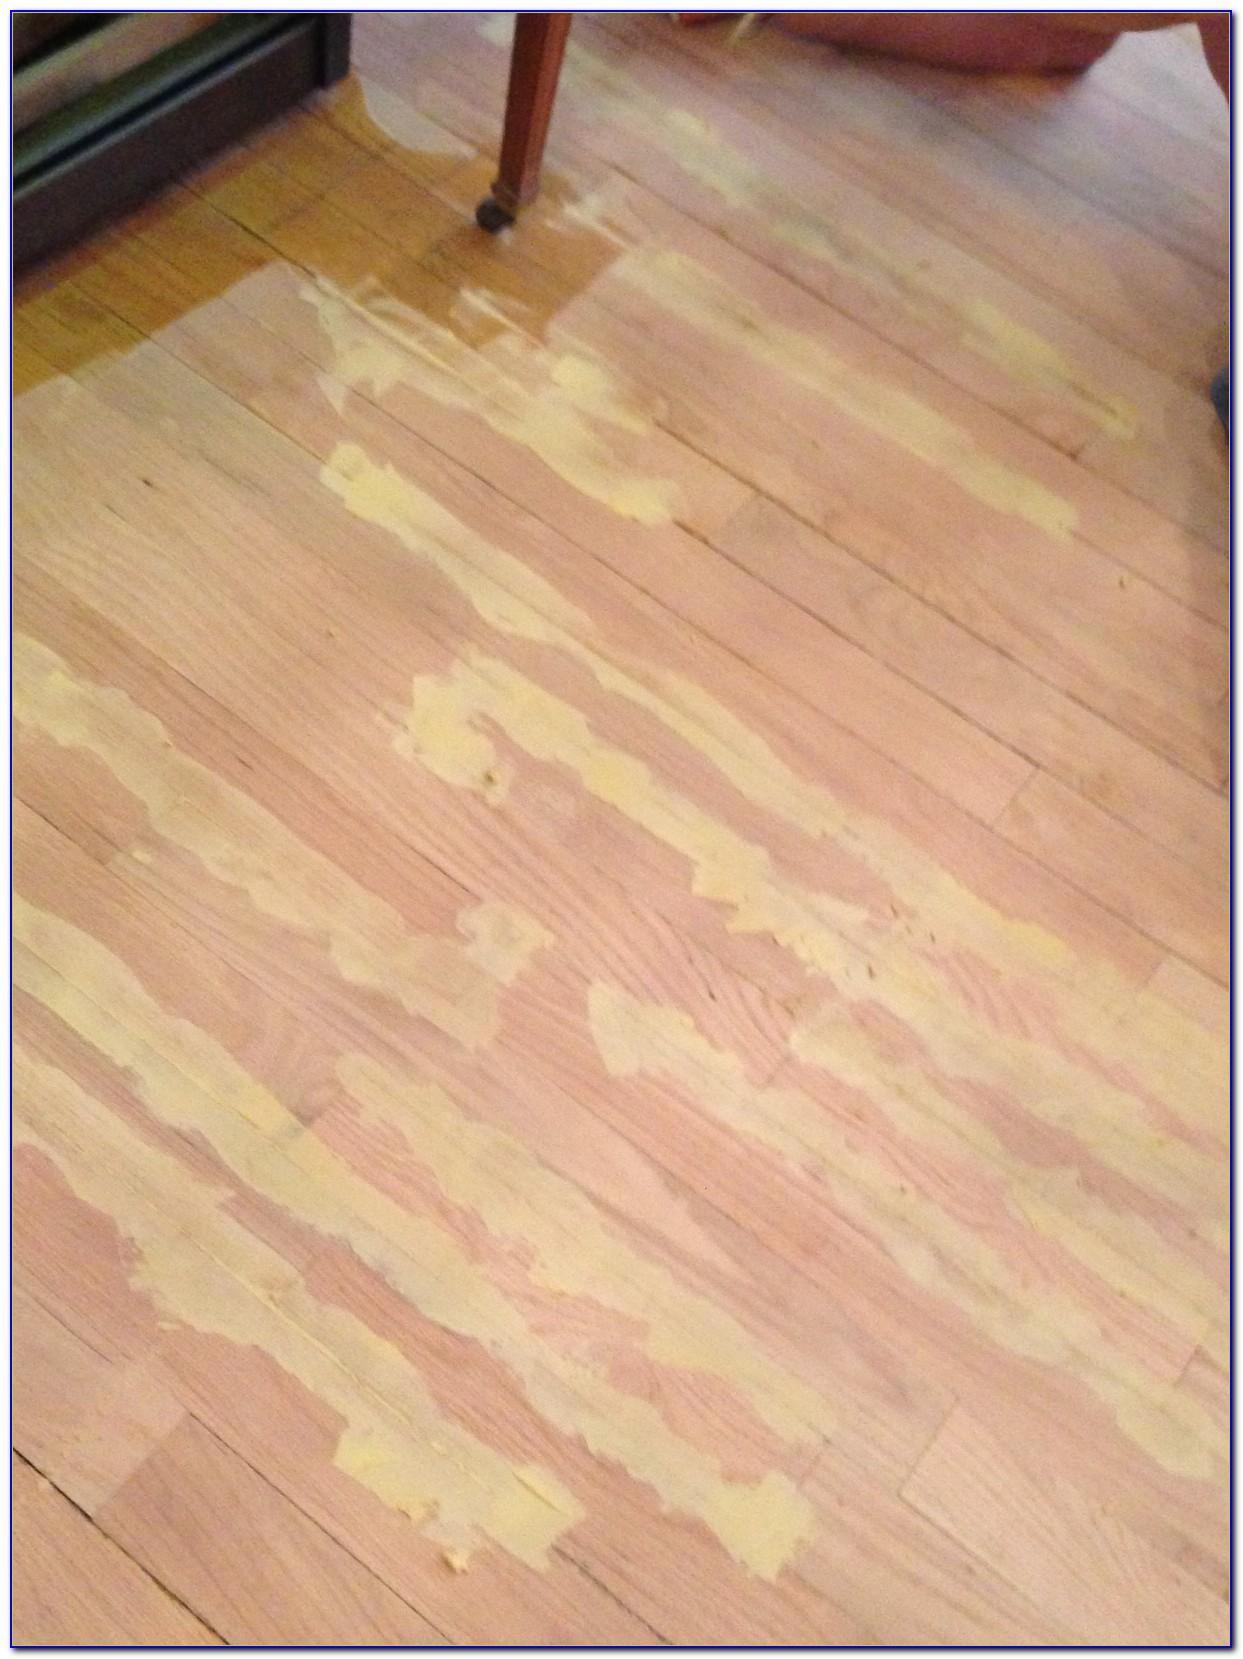 Stainable Wood Filler For Hardwood Floors